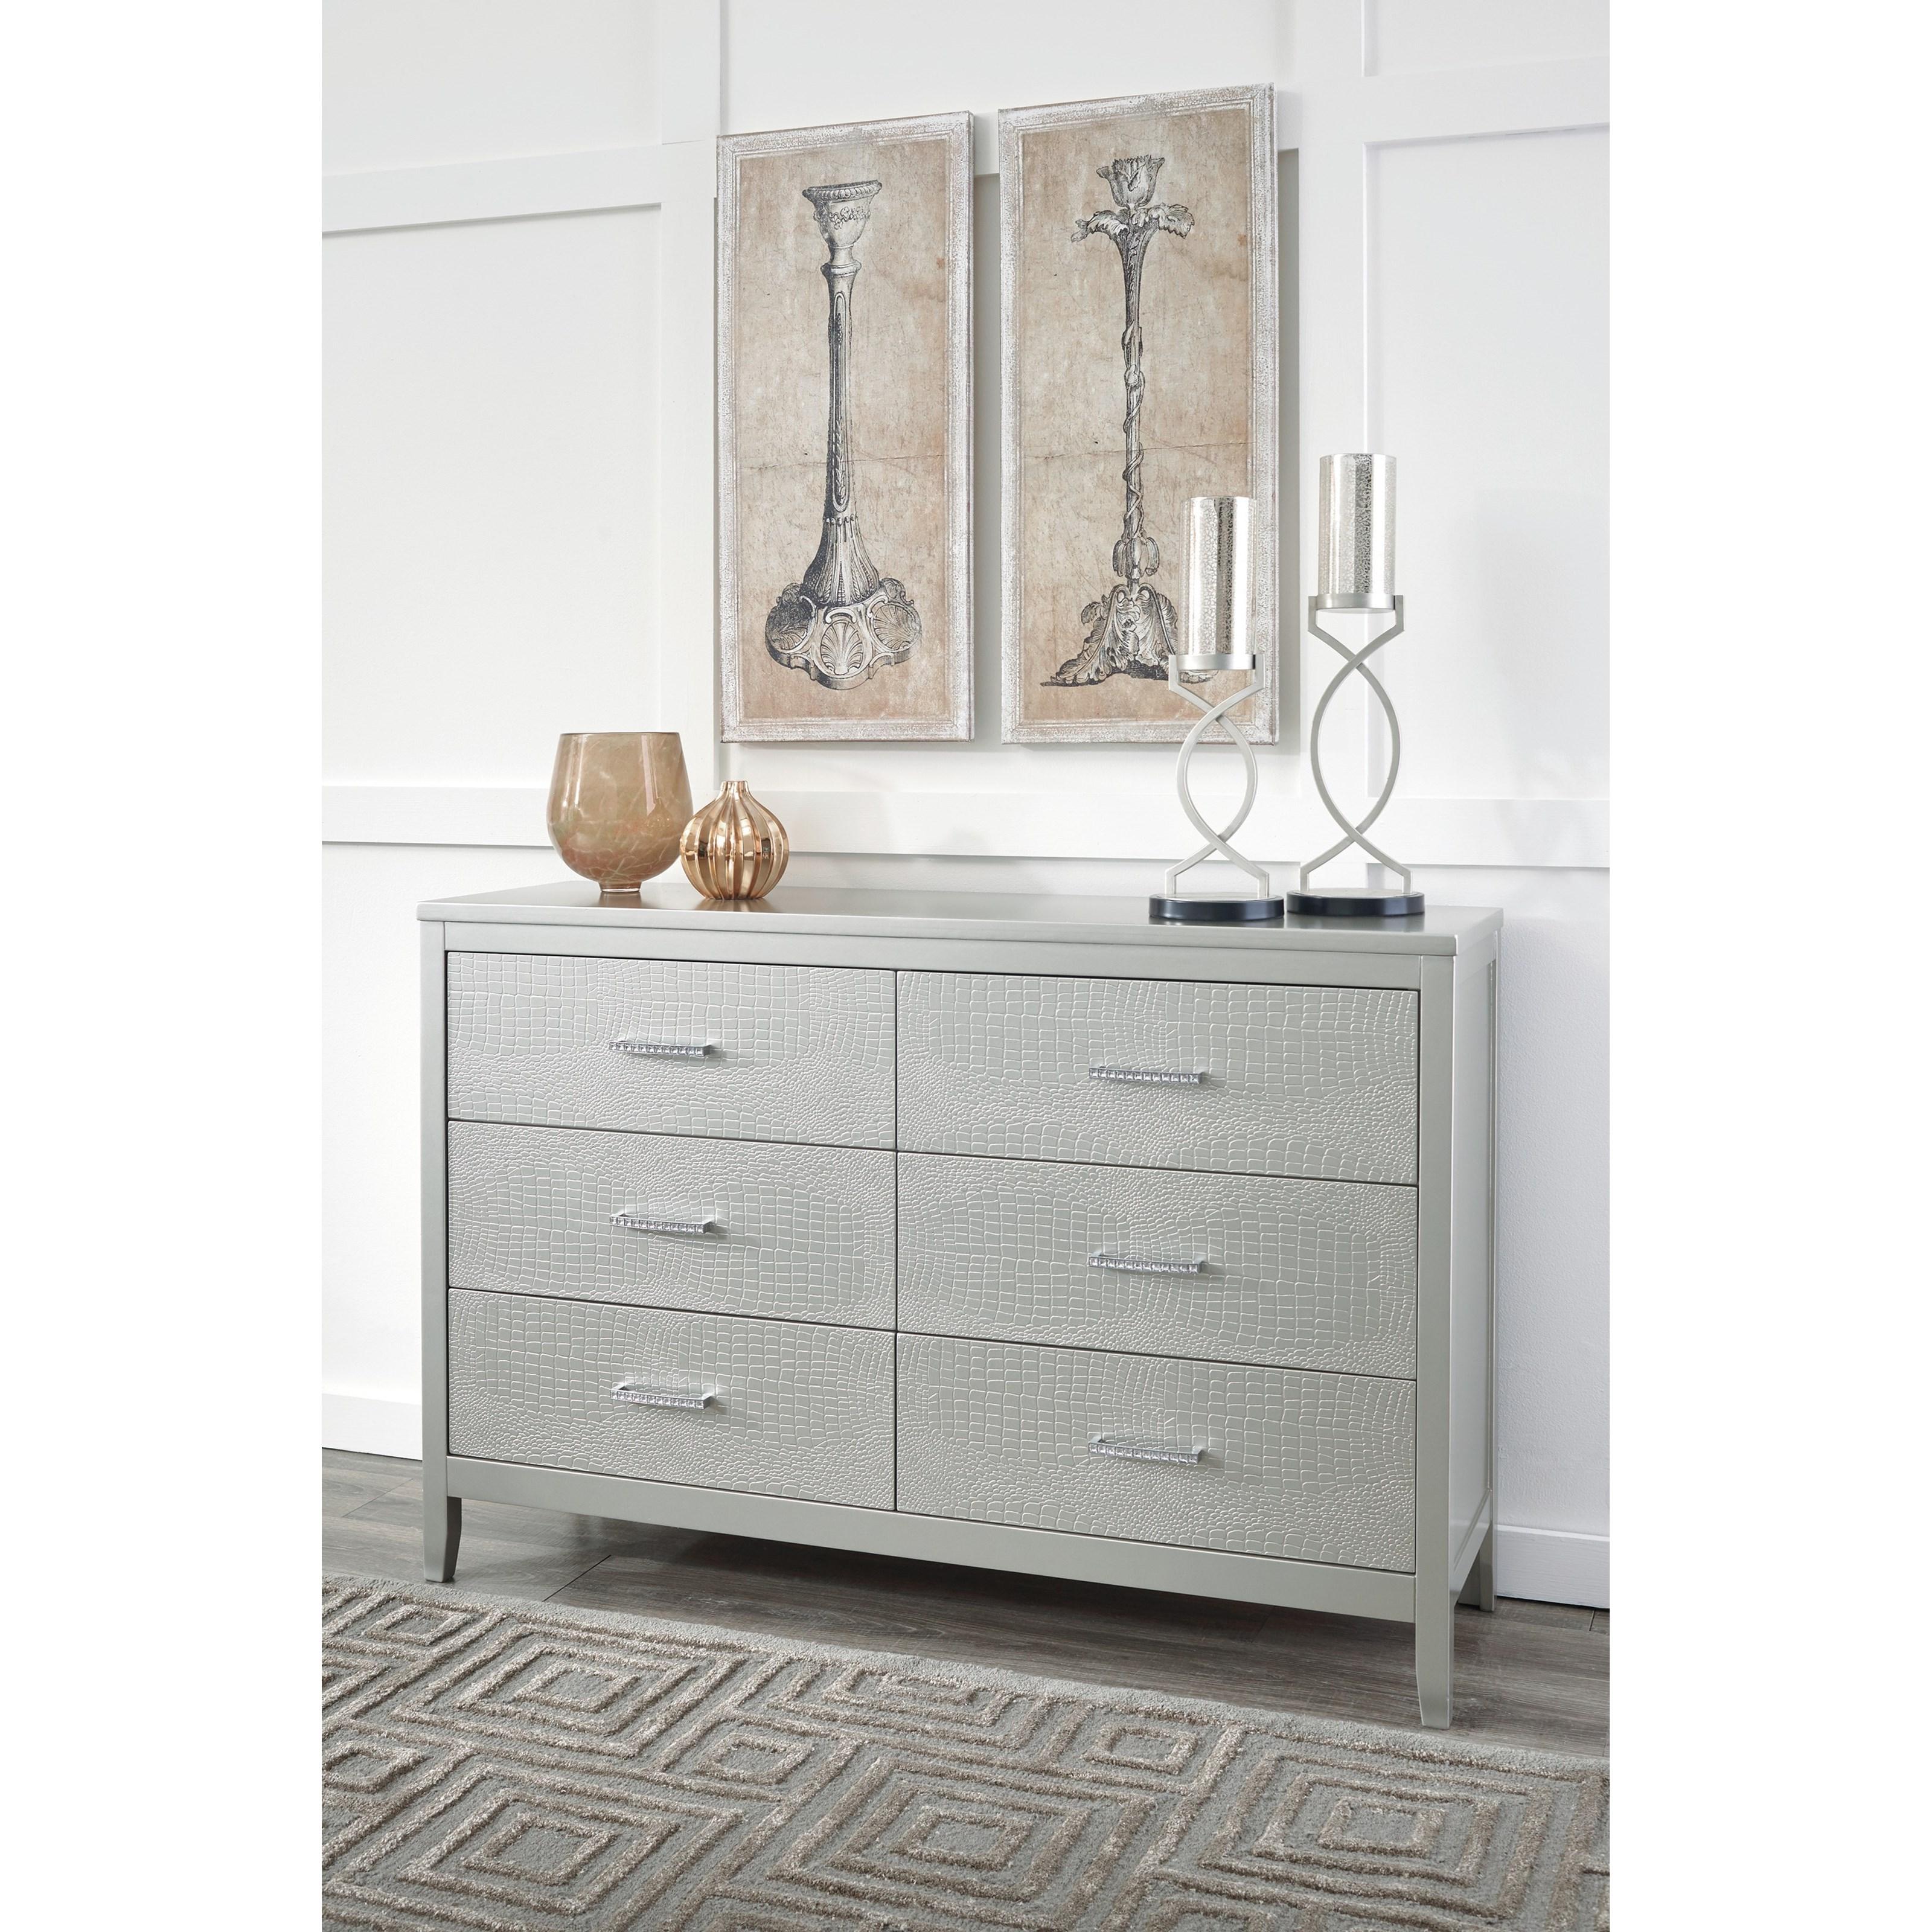 Signature Design By Ashley Olivet B560 31 Glam Dresser